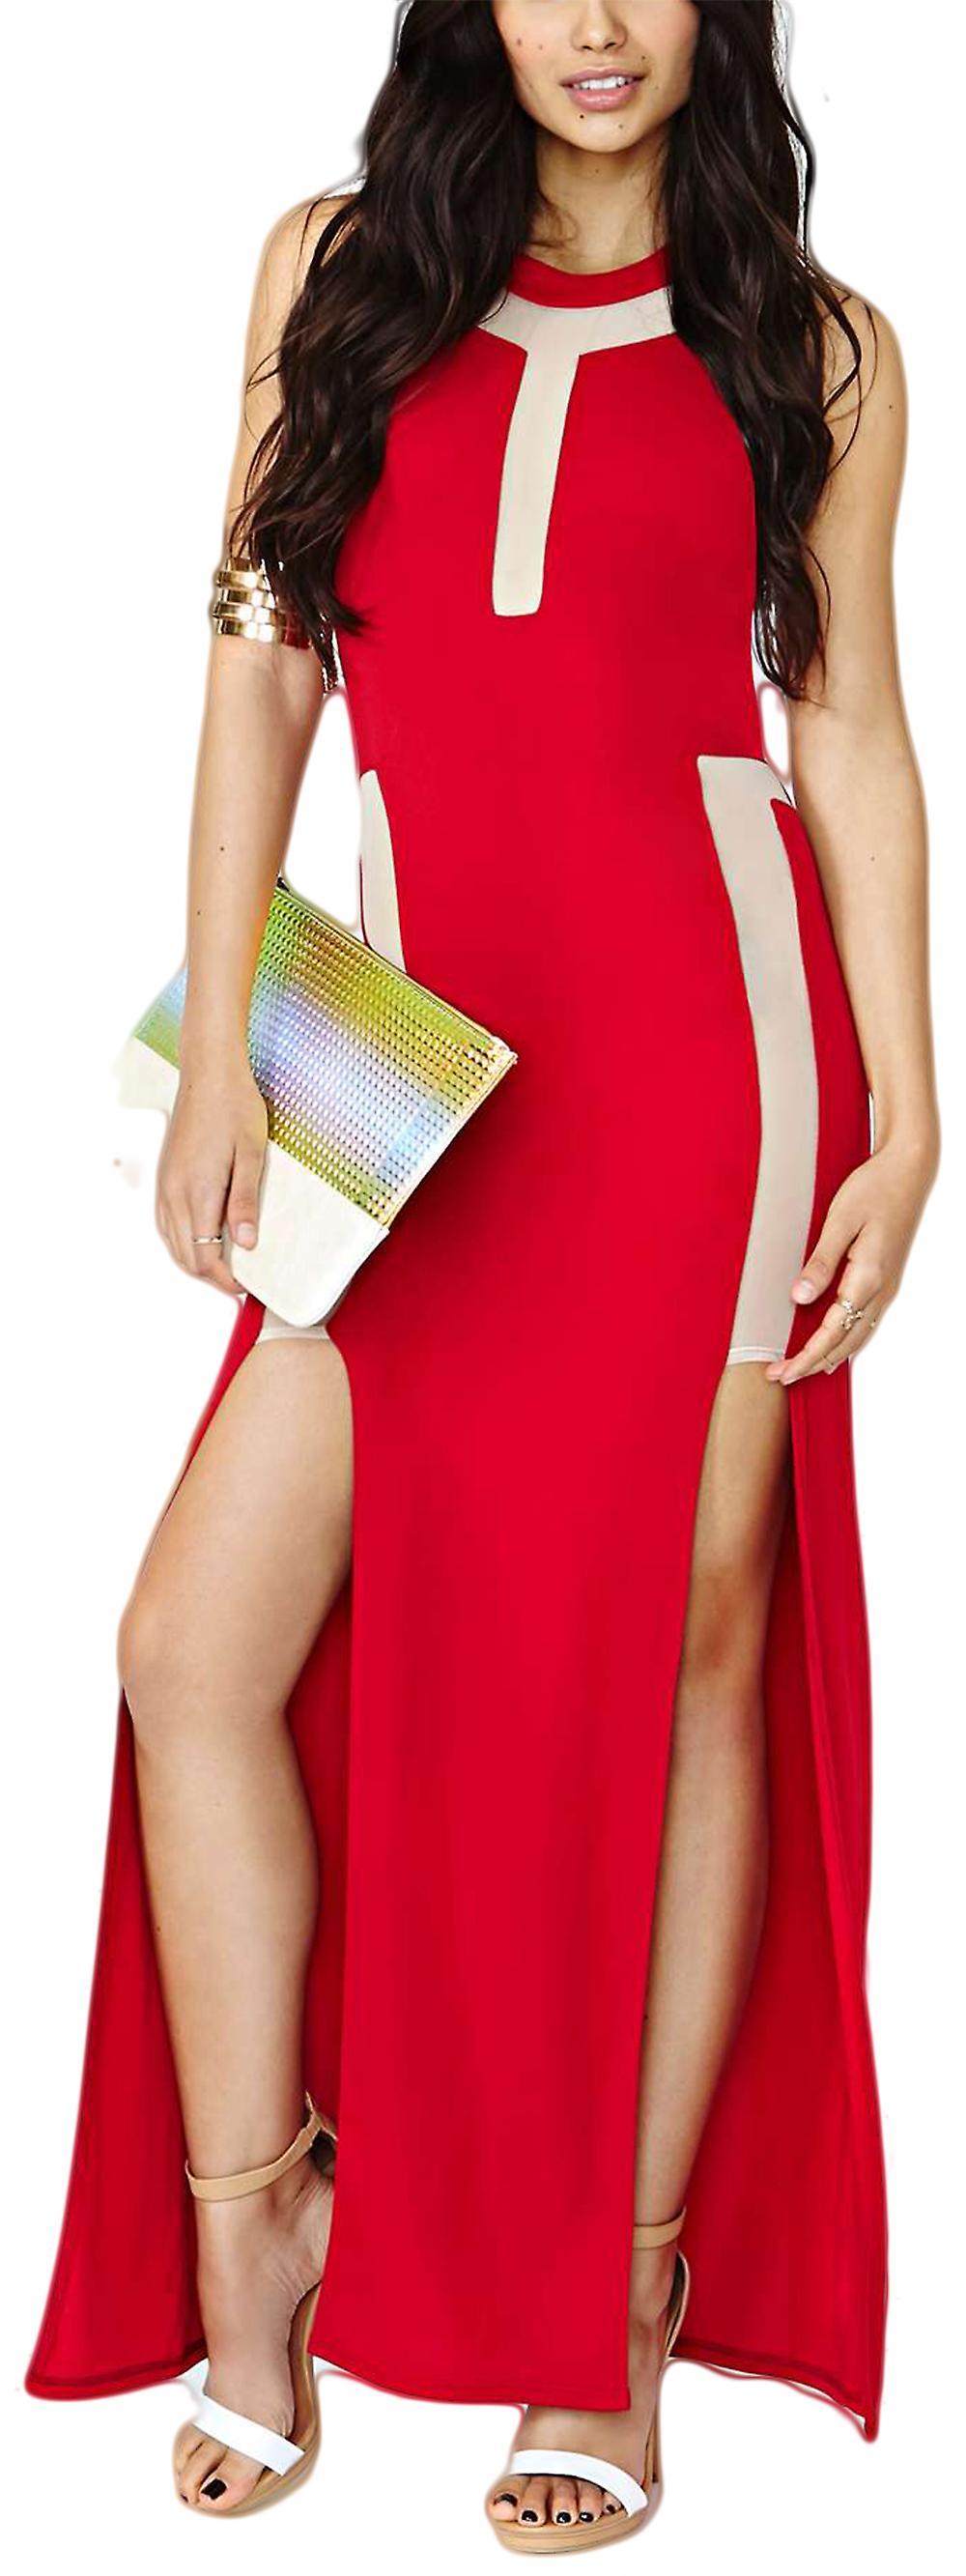 Waooh - long dress slit Tenee